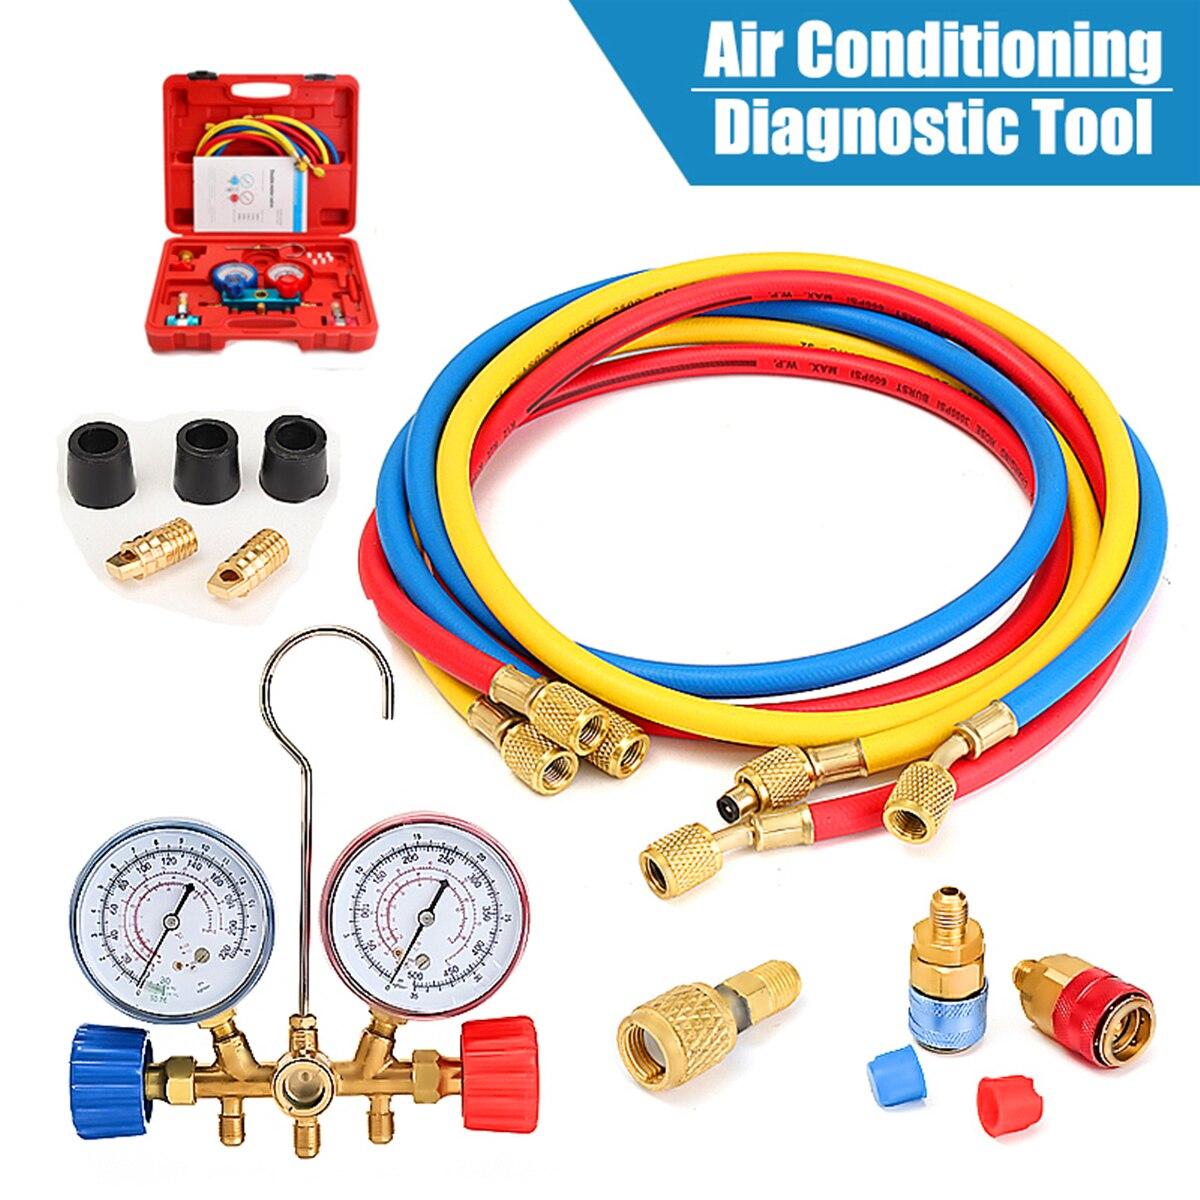 Auto HVAC A/C Refrigerazione Kit Collettore Gauge Set per R22 R12 R134A Auto Refrigerante H/L Rapido accoppiatore Manometro Tool Set